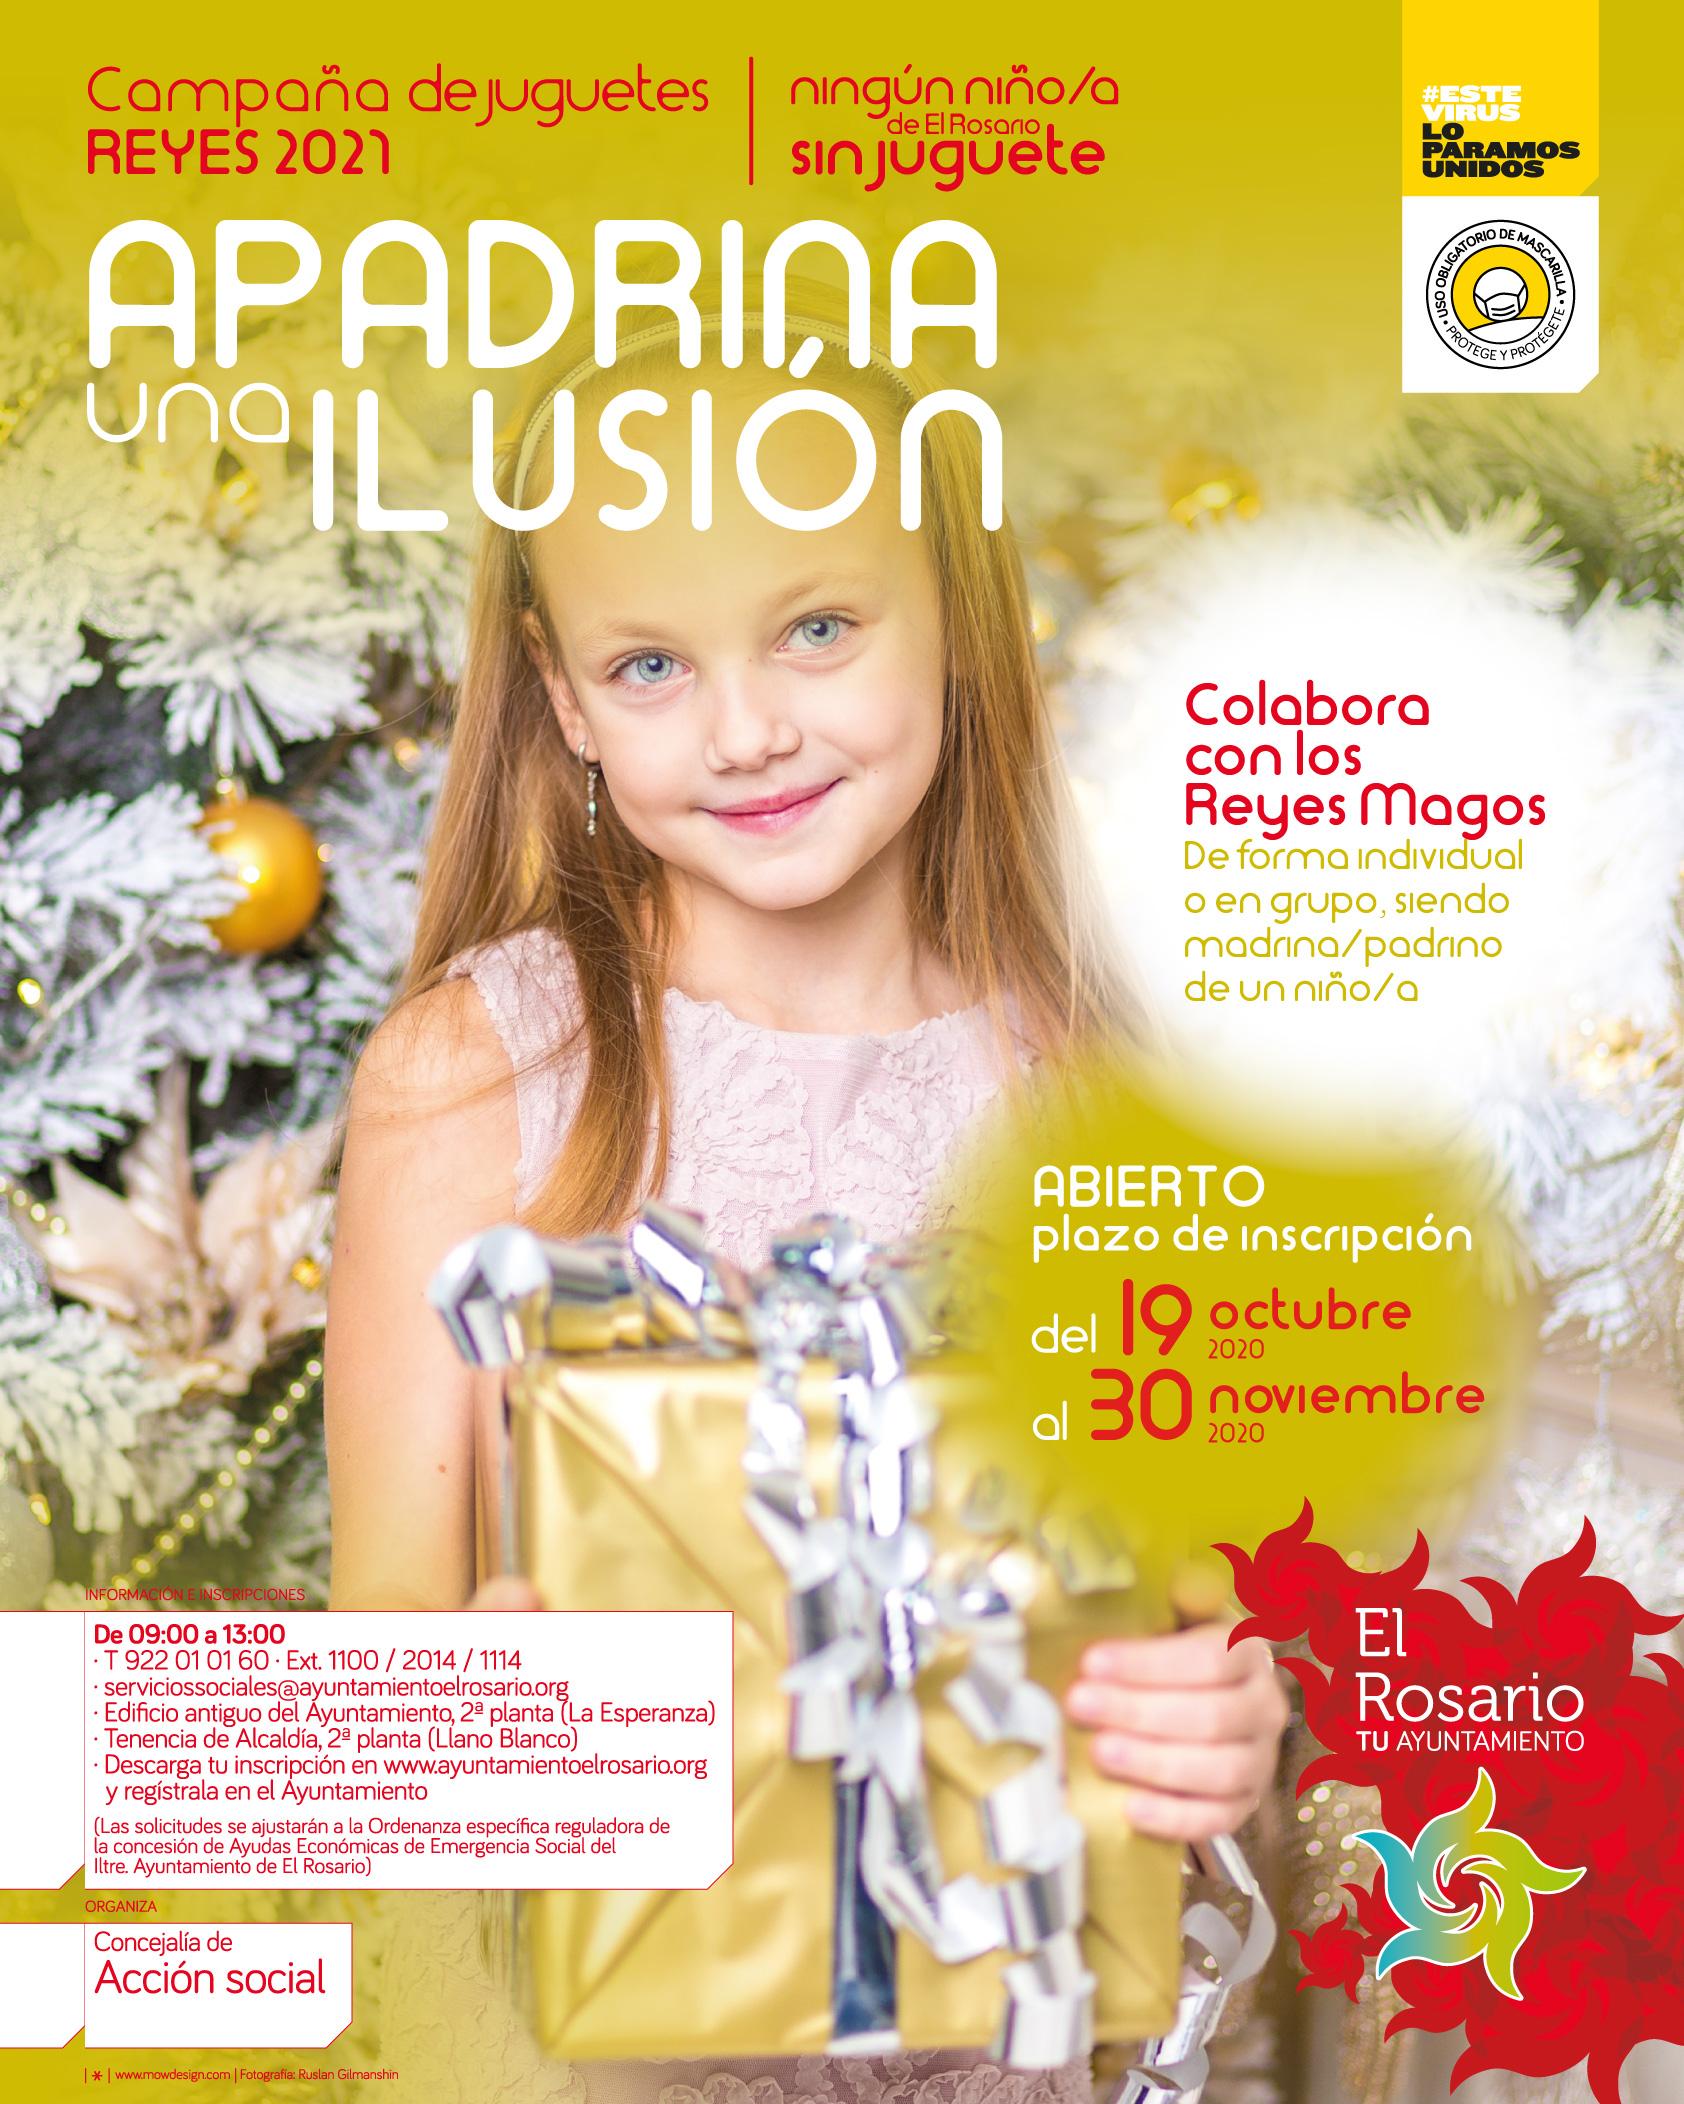 APADRINA_UNA_ILUSION-20201006-CARTEL_A3-20201015-01af-redes